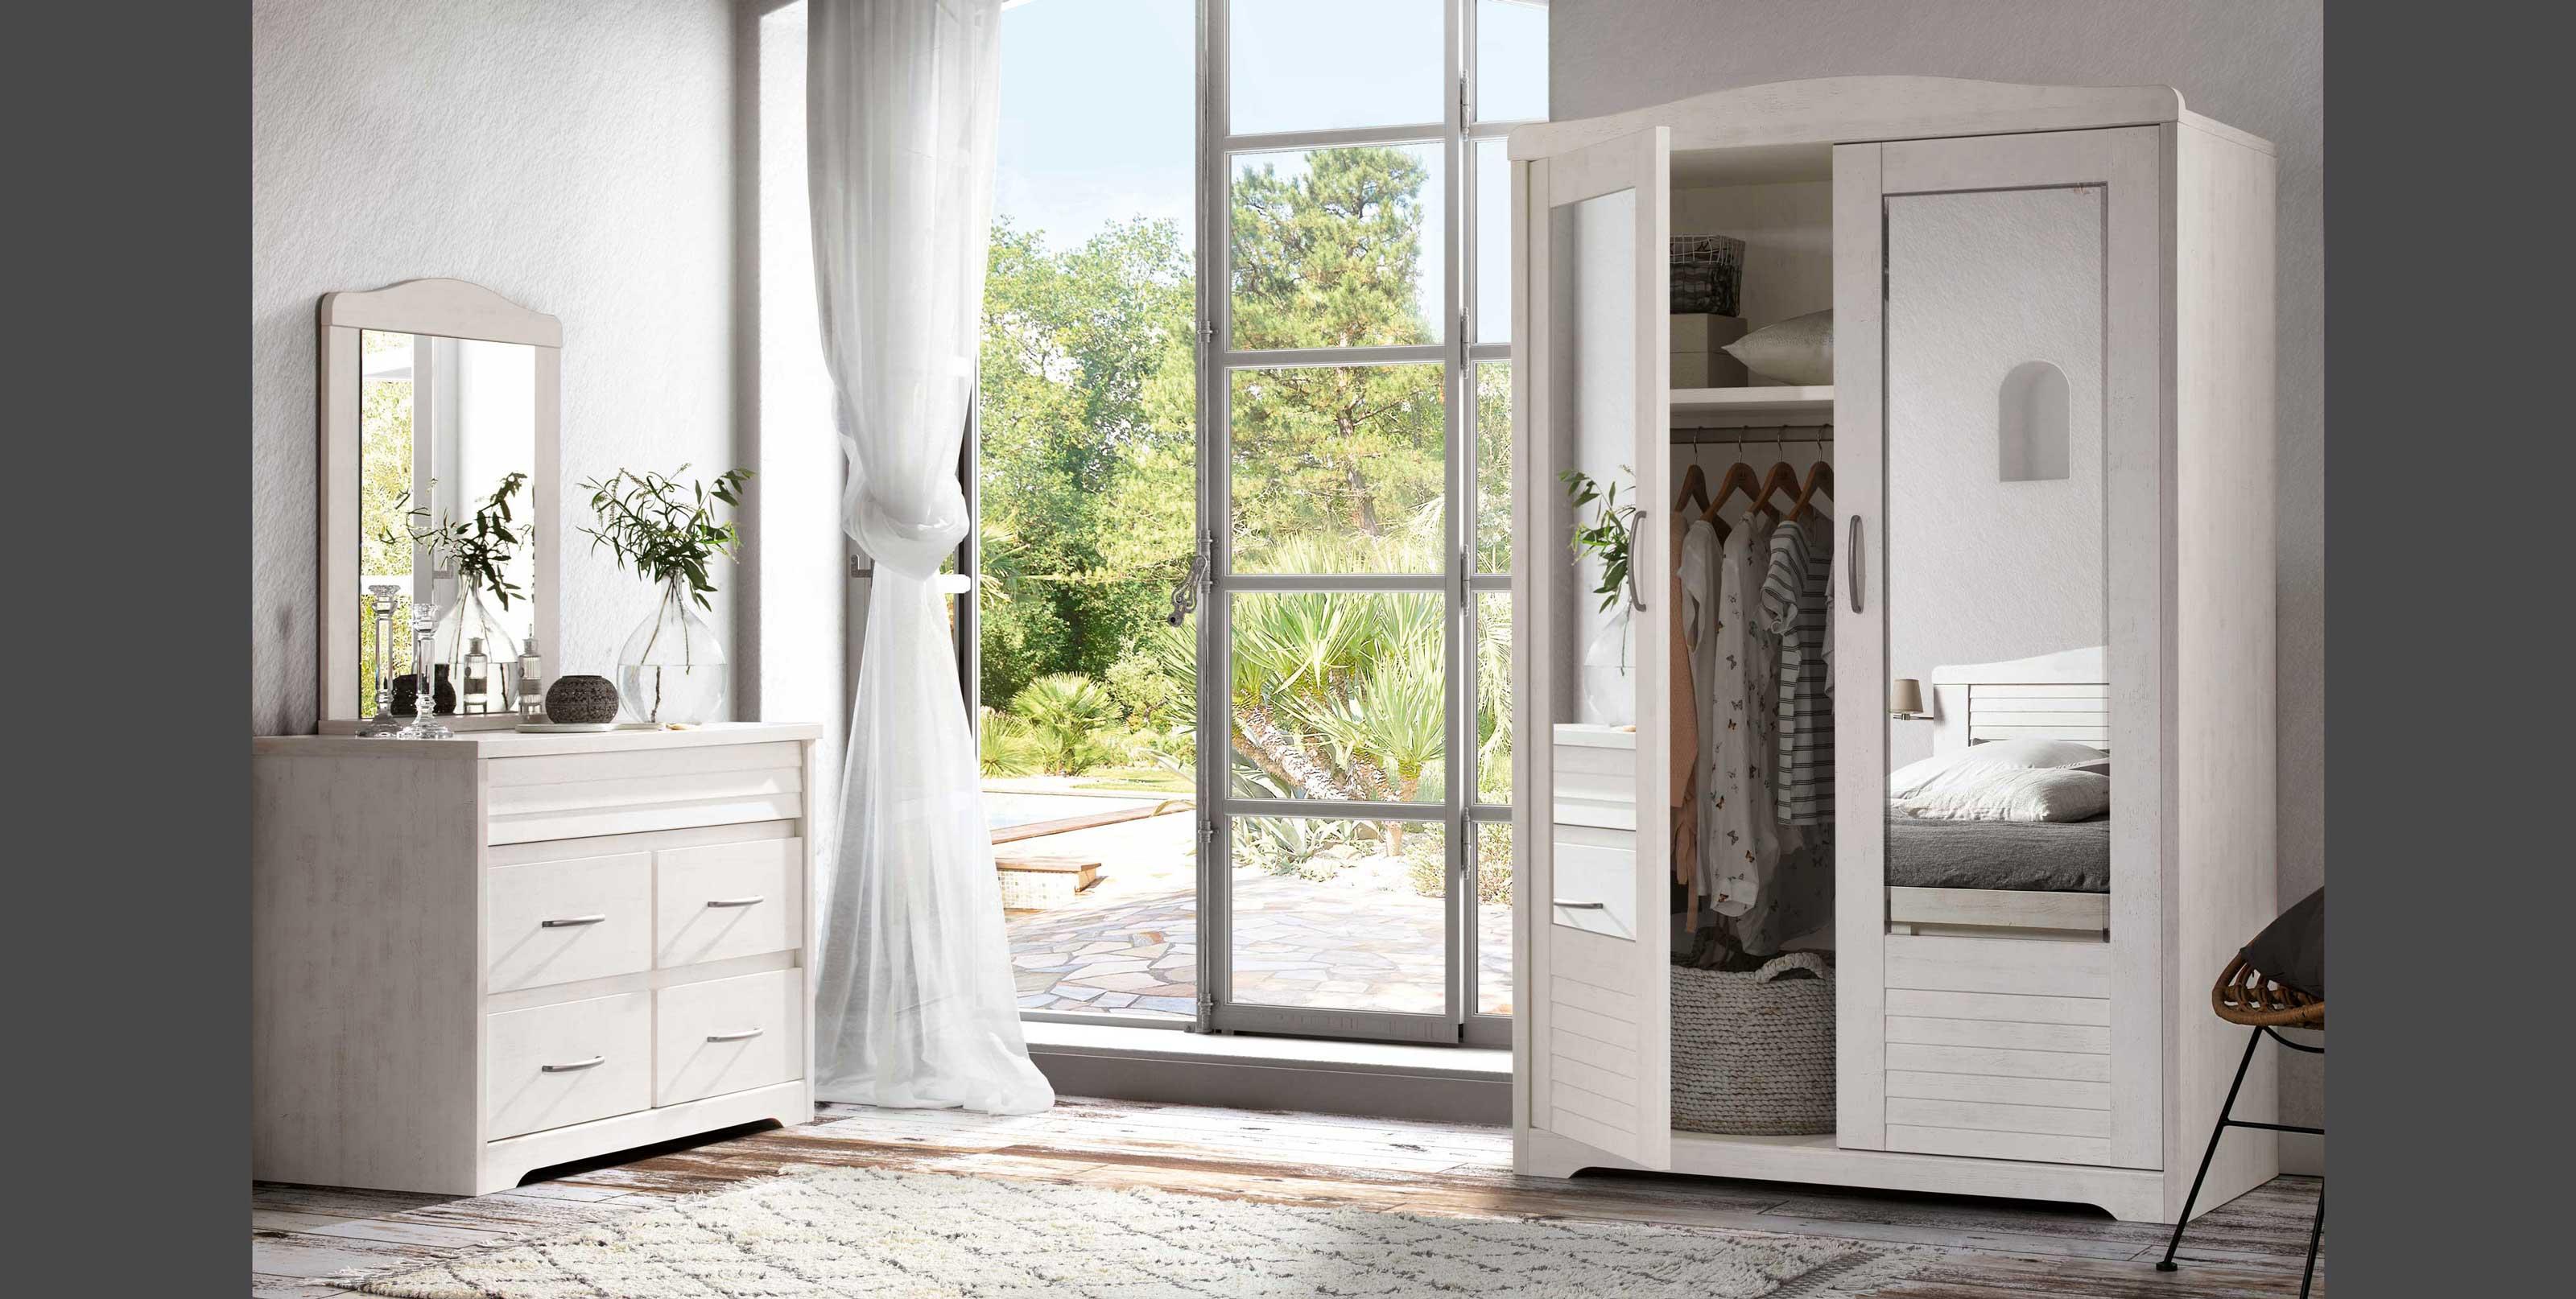 chambre olivia c lio meubles steinmetz. Black Bedroom Furniture Sets. Home Design Ideas